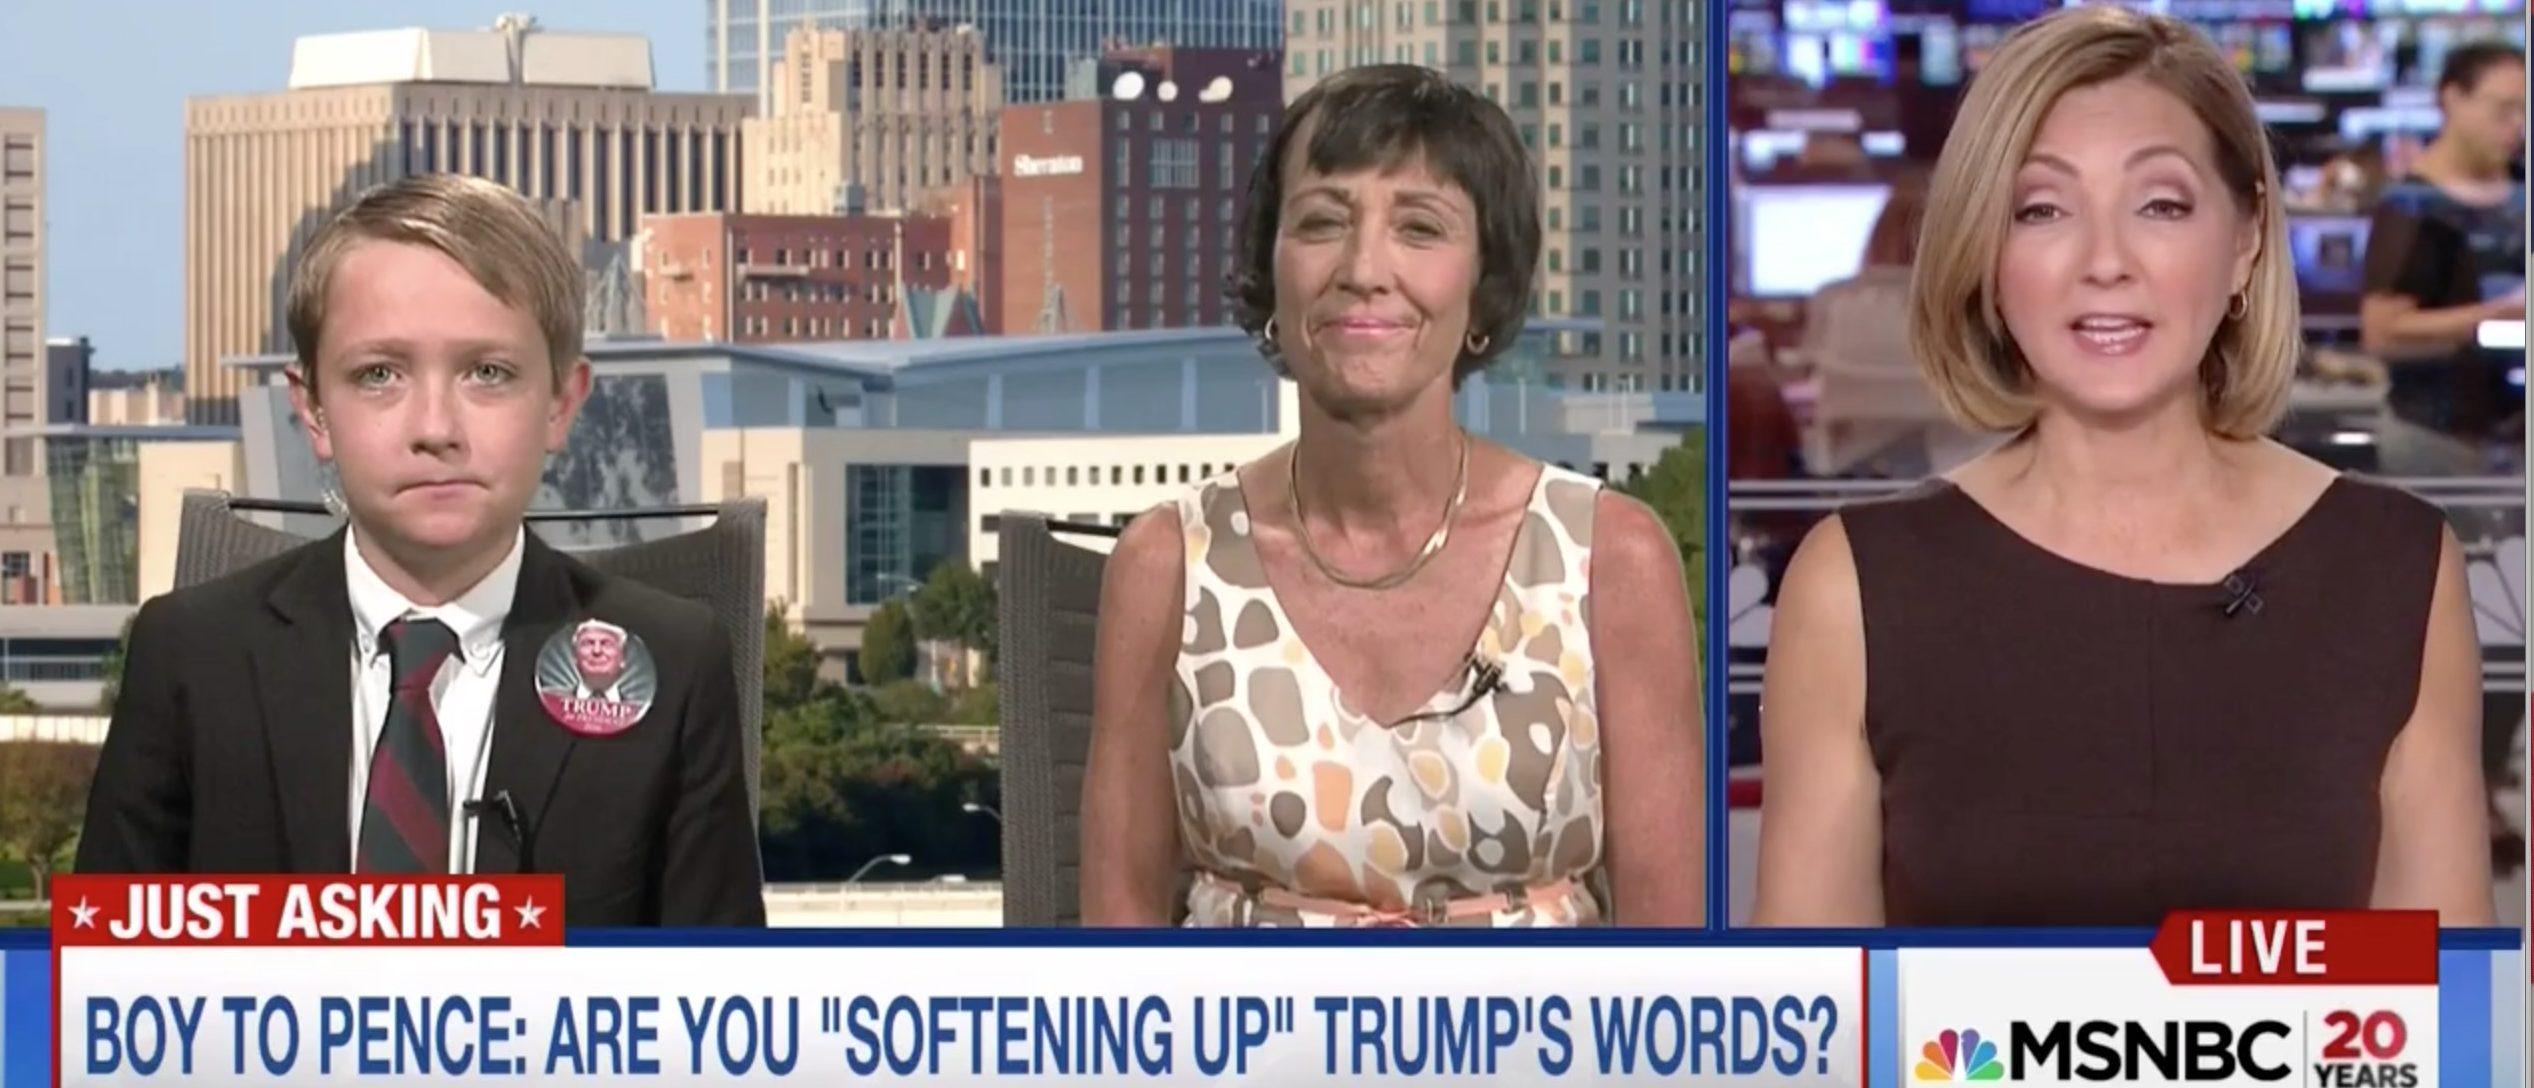 Chris Jansing, Matthew Schricker, Screen Grab MSNBC, 8-5-2016